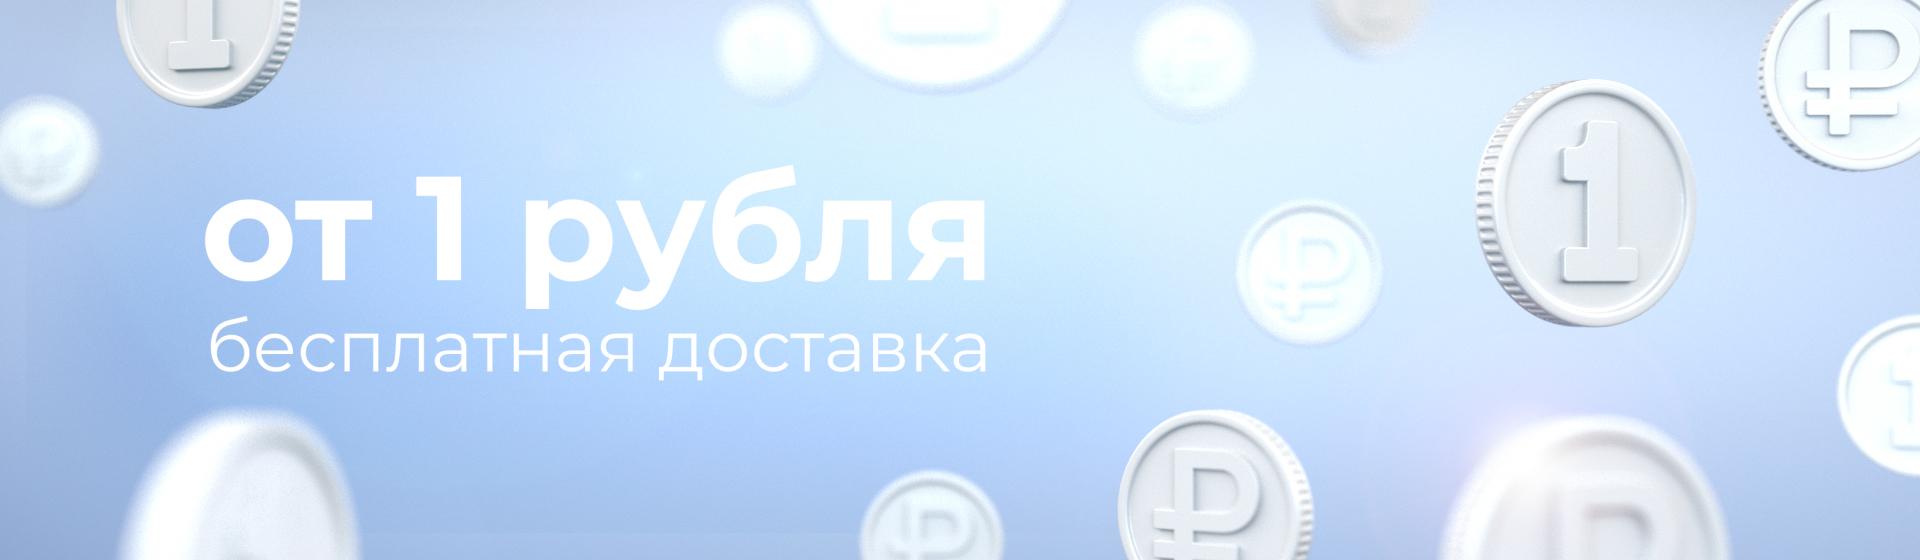 Доставка от 1 рубля бесплатно